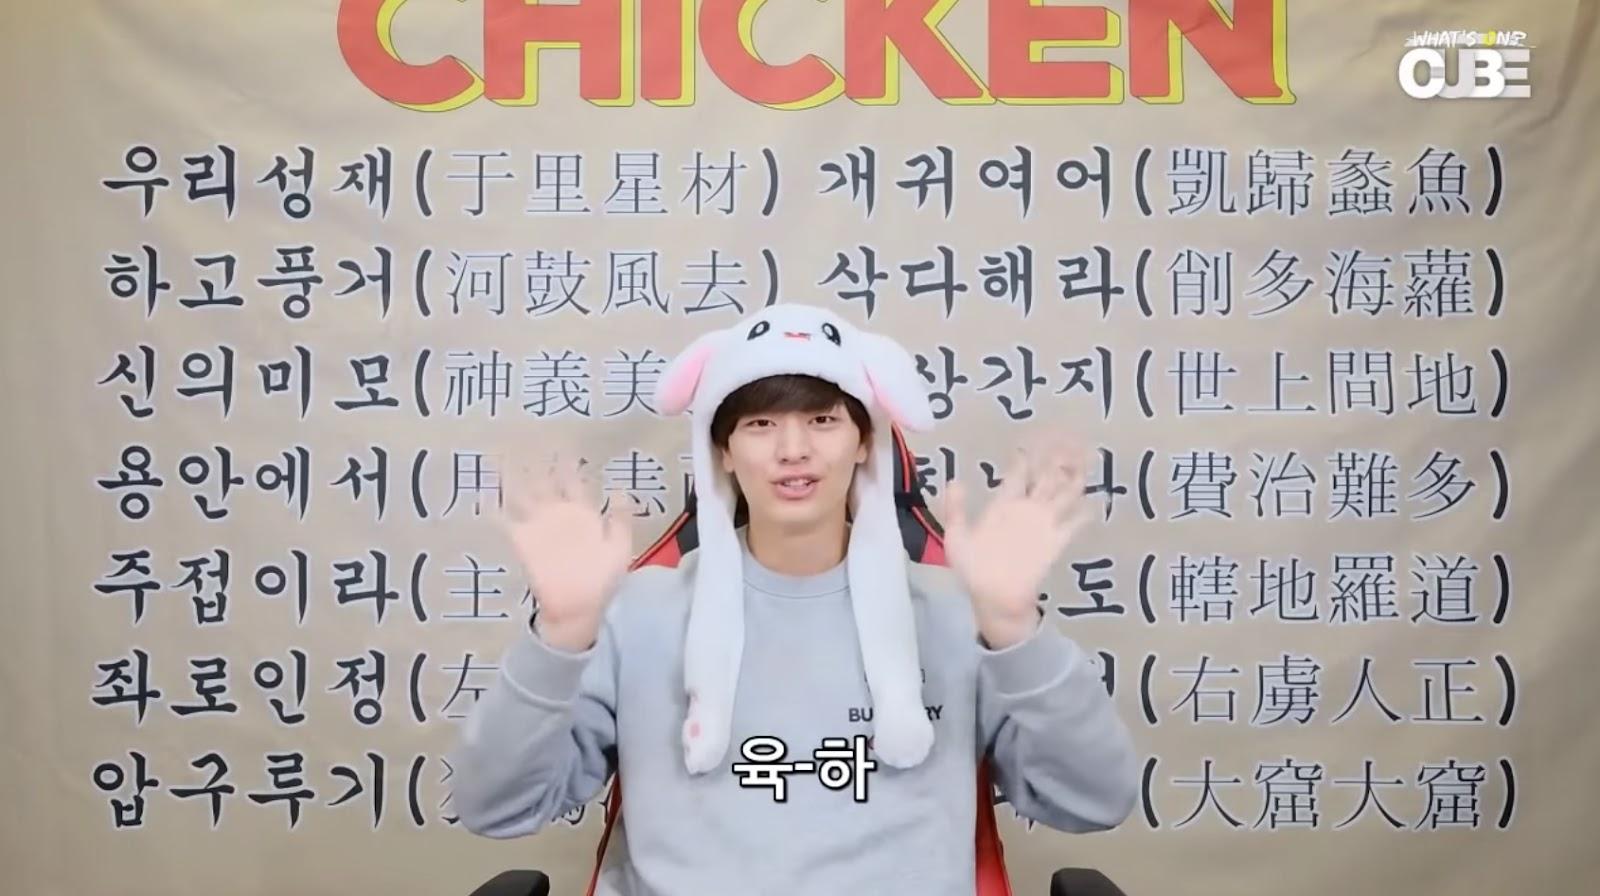 yook sung jae cube